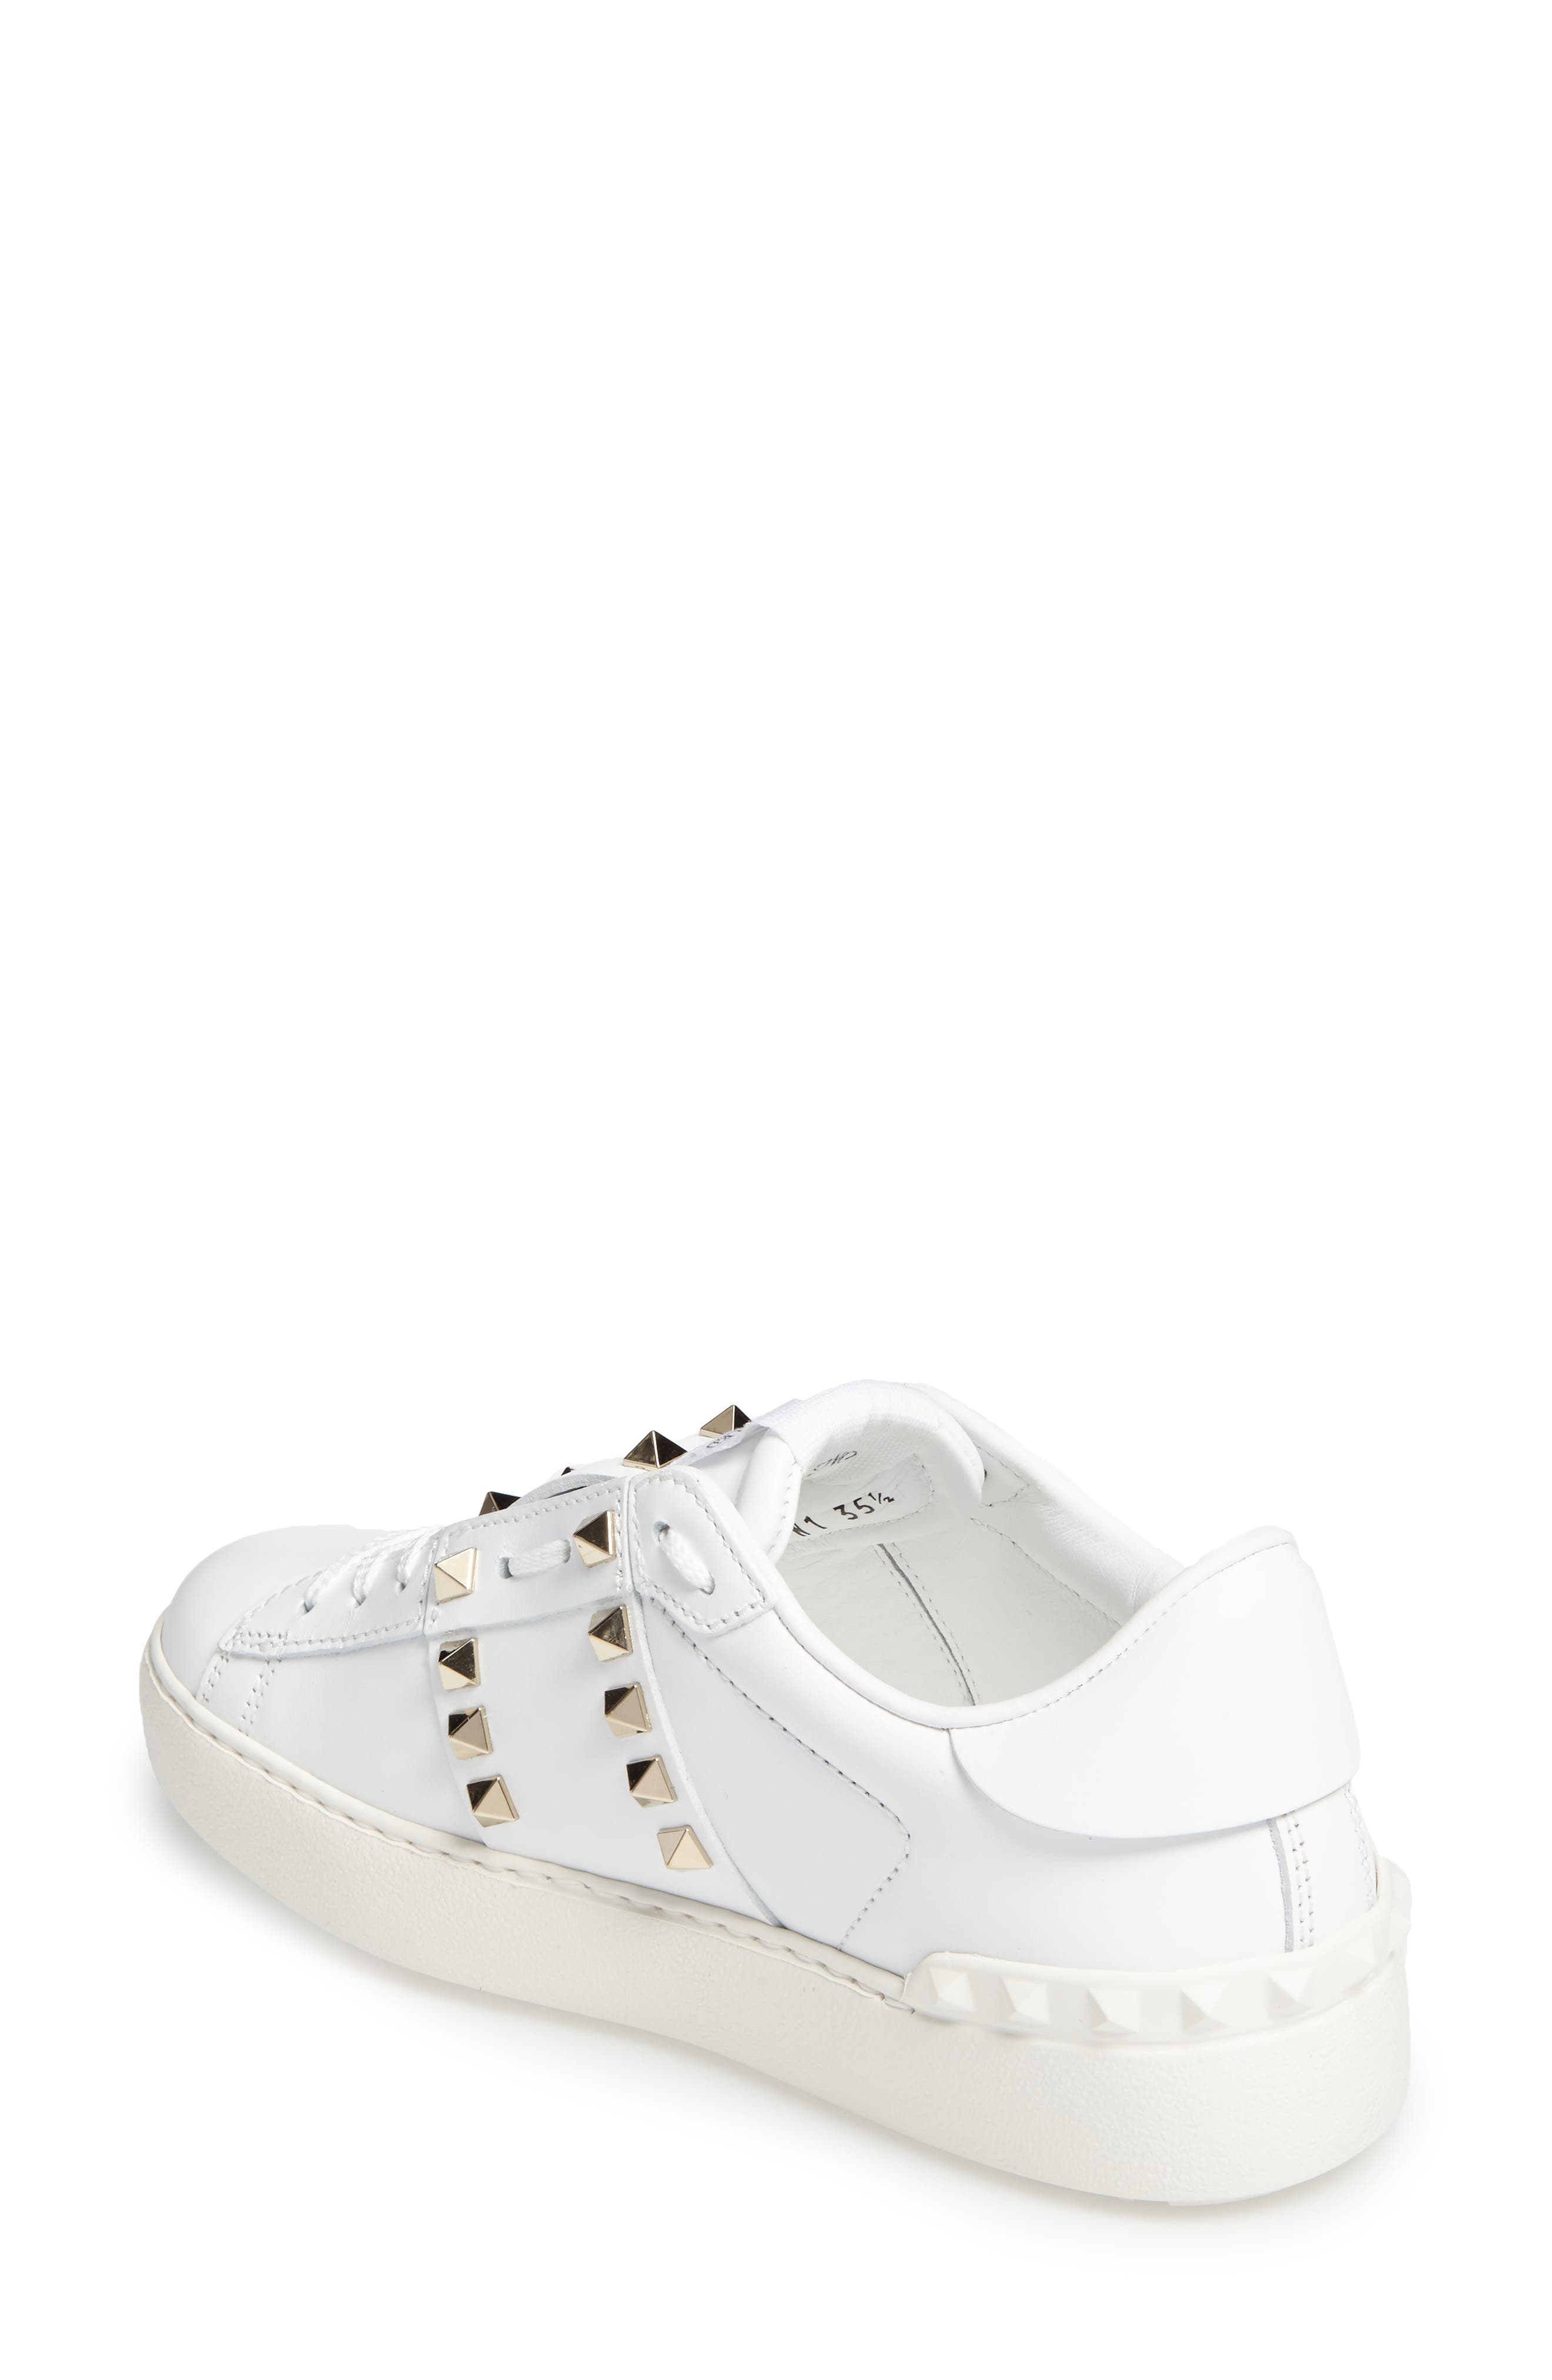 'Rockstud' Sneaker,                             Alternate thumbnail 2, color,                             WHITE LEATHER